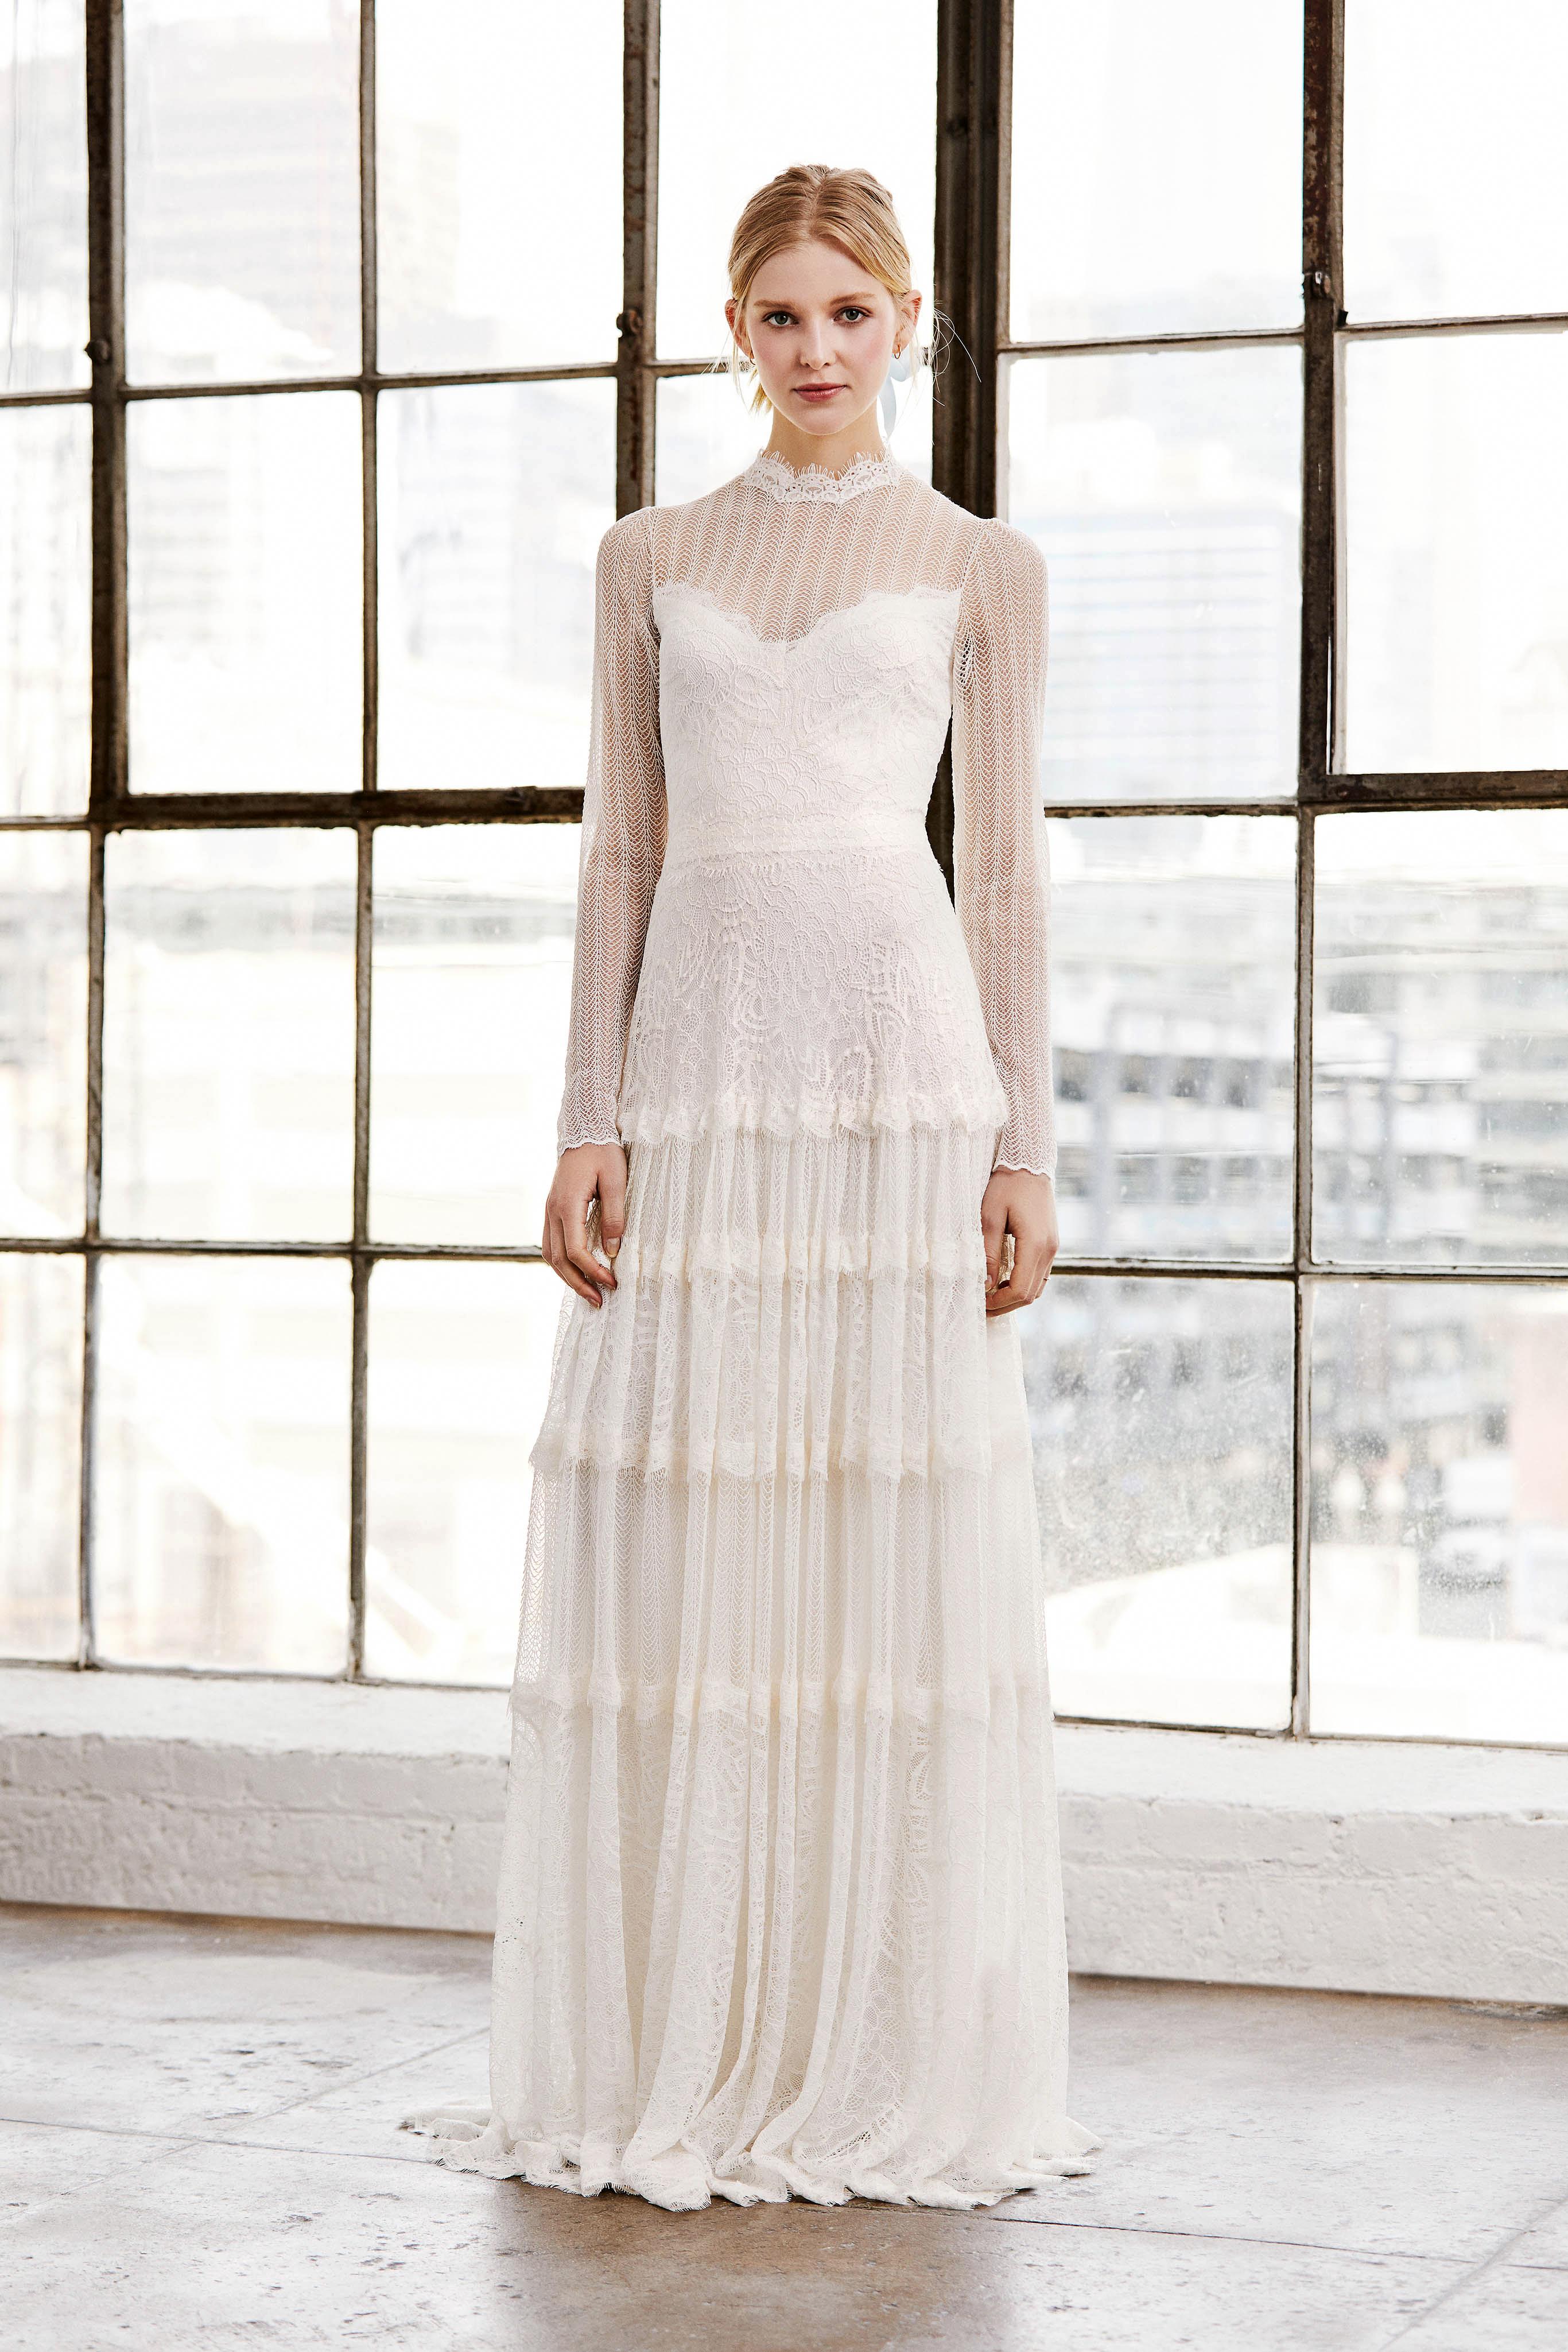 tadashi shoji wedding dress spring 2019 long sleeves illusion tiers